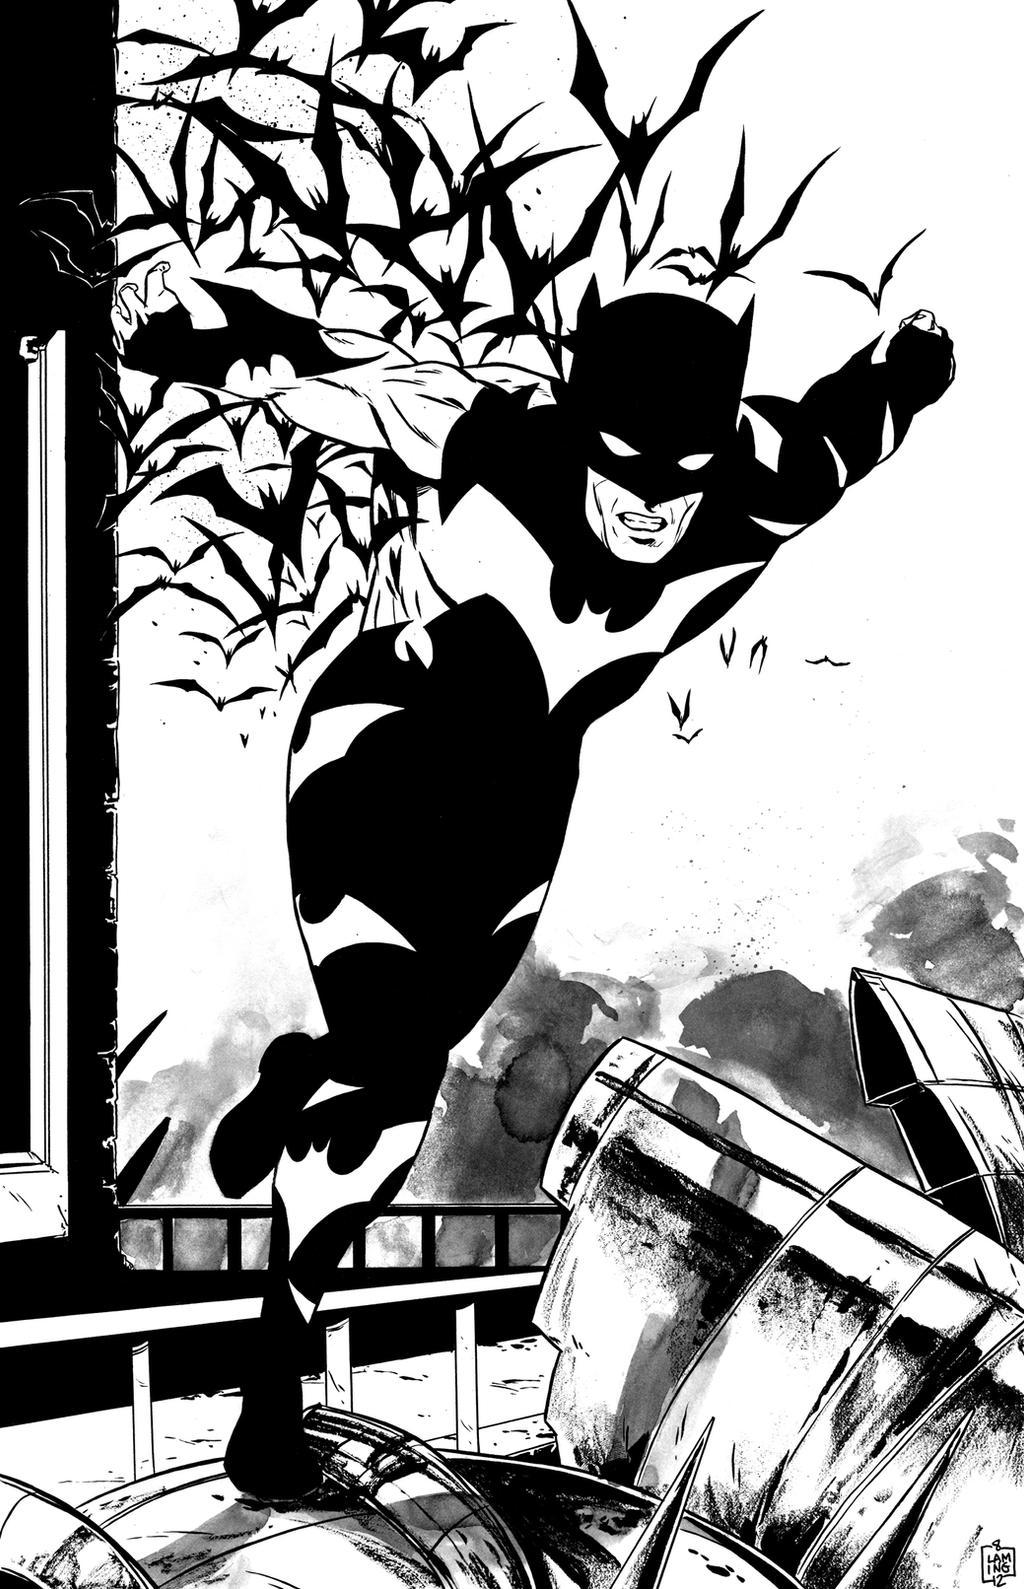 BATSMAN inks by MarcLaming